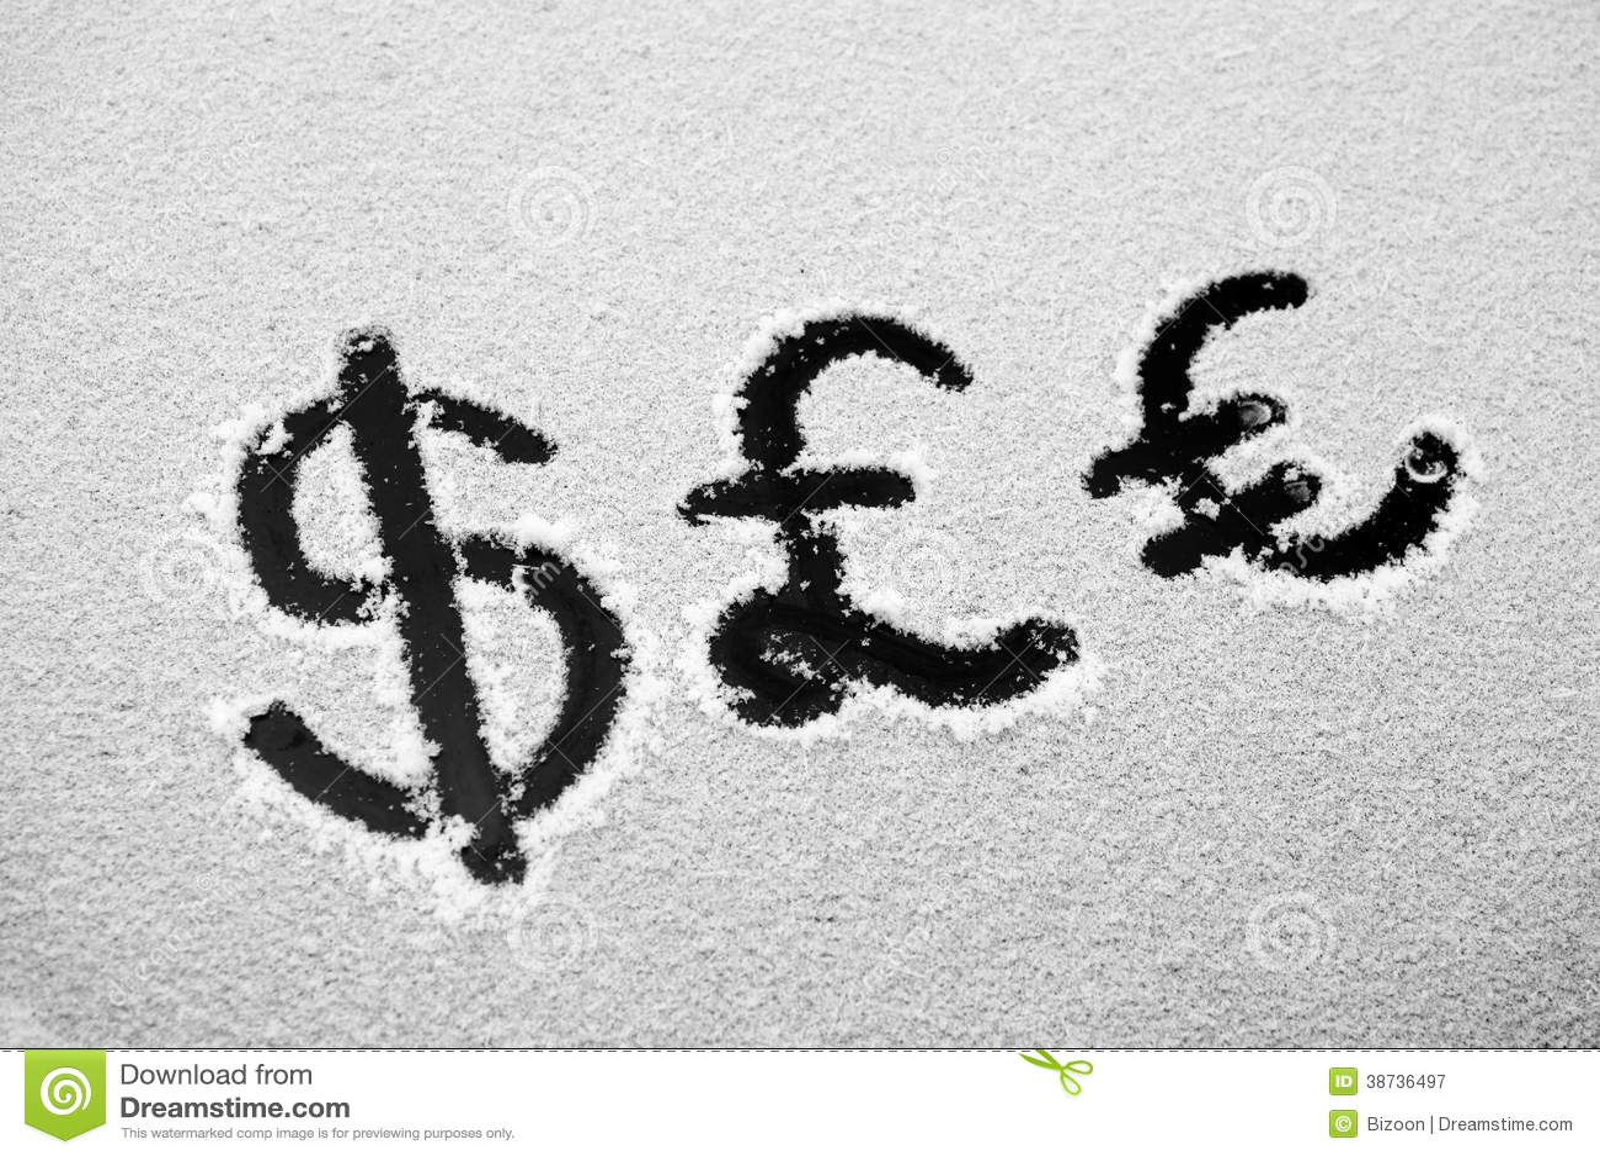 Dollar British Pound And Euro Sign Stock Illustration